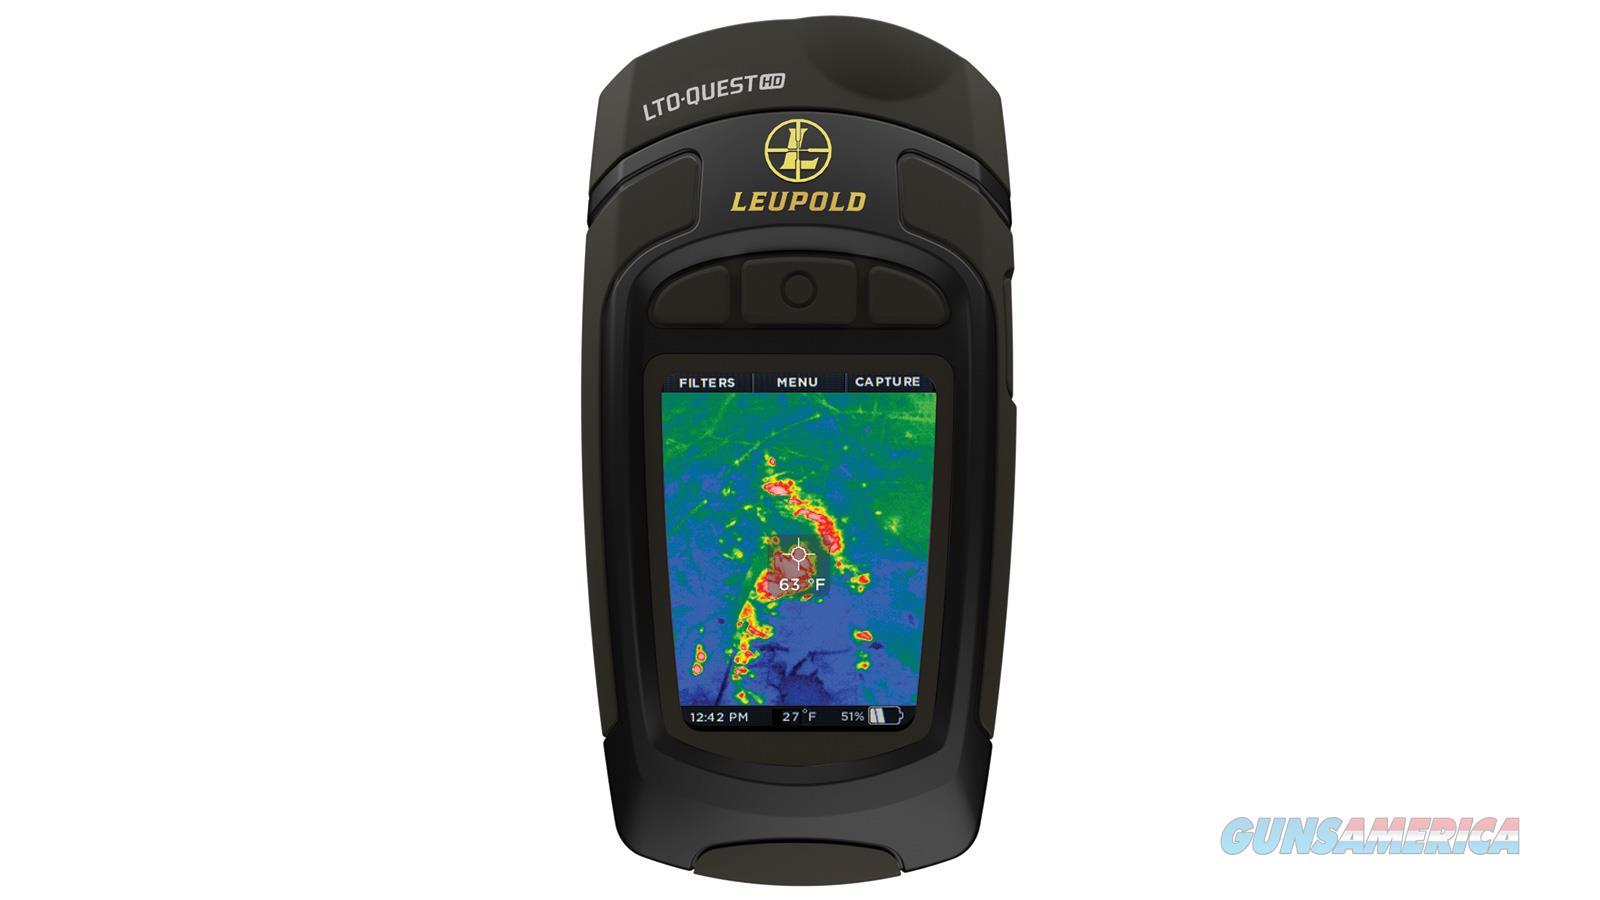 Leupold Quest Hd Thermal Image Camera Flashlight 173882  Non-Guns > Night Vision